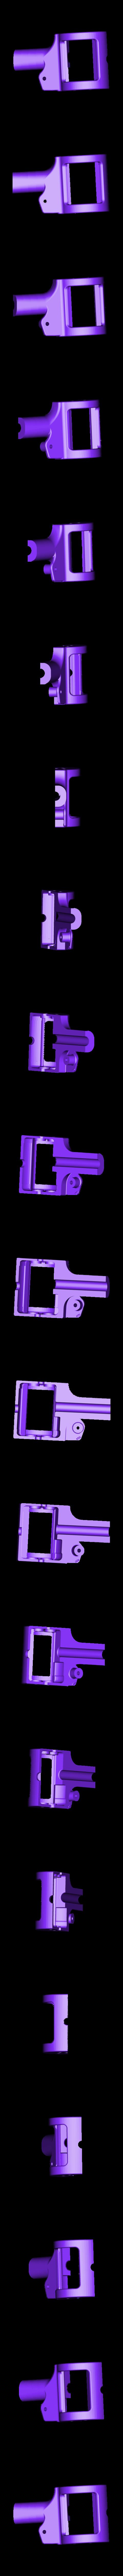 arm rear1 (1pcs).STL Download STL file Folding Quadcopter 450 Frame • 3D print object, AleksandrDolzhenko